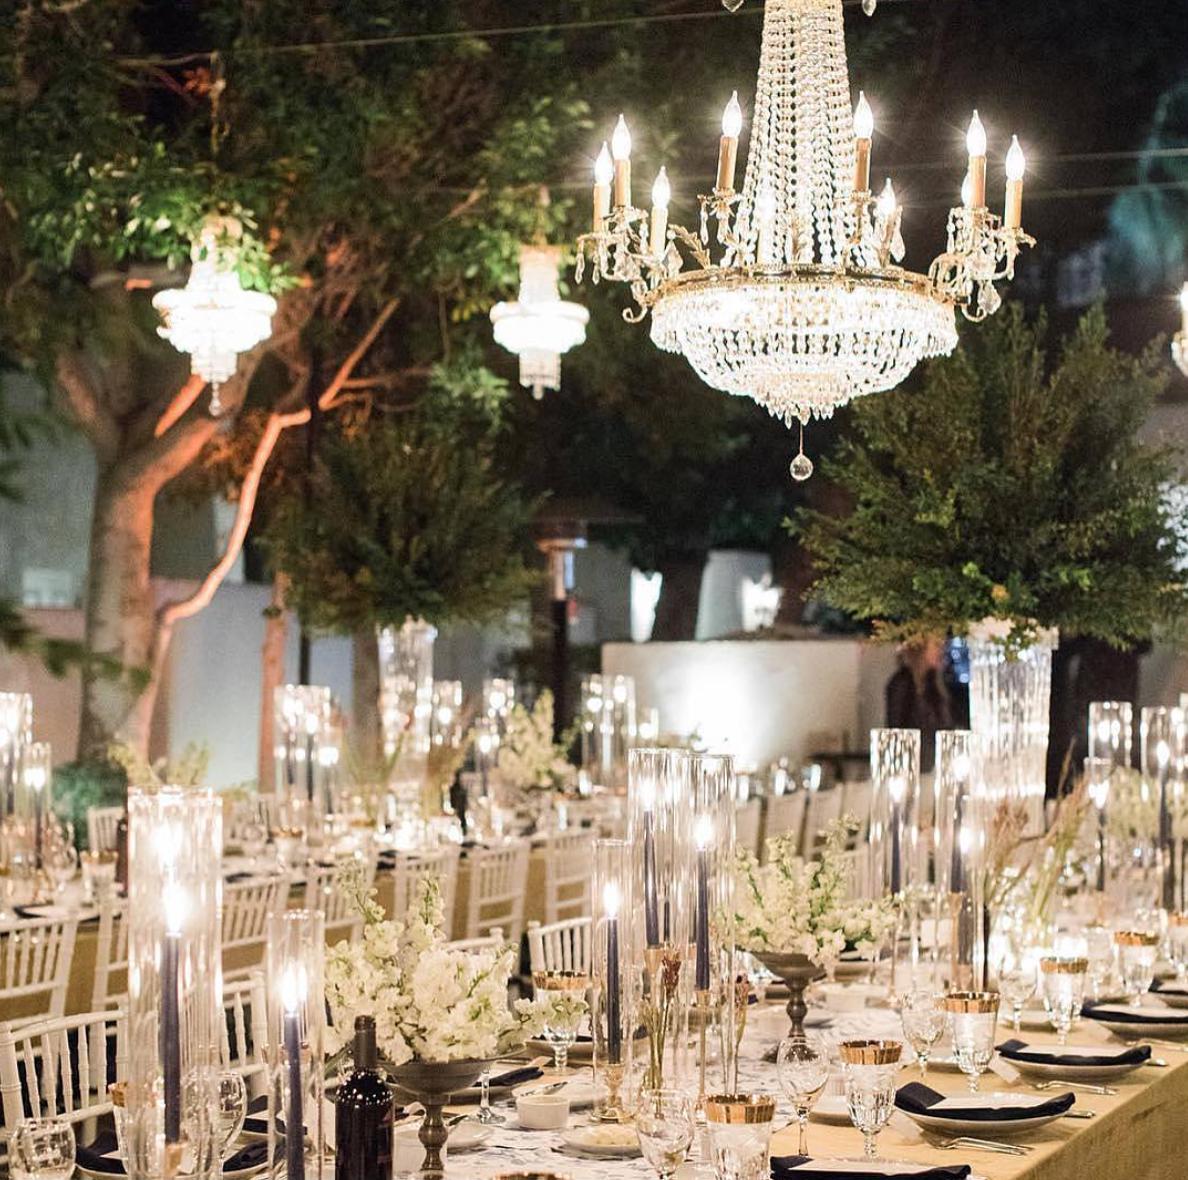 Summer Outdoor Wedding Decorations Ideas 12: Signature Party Rentals